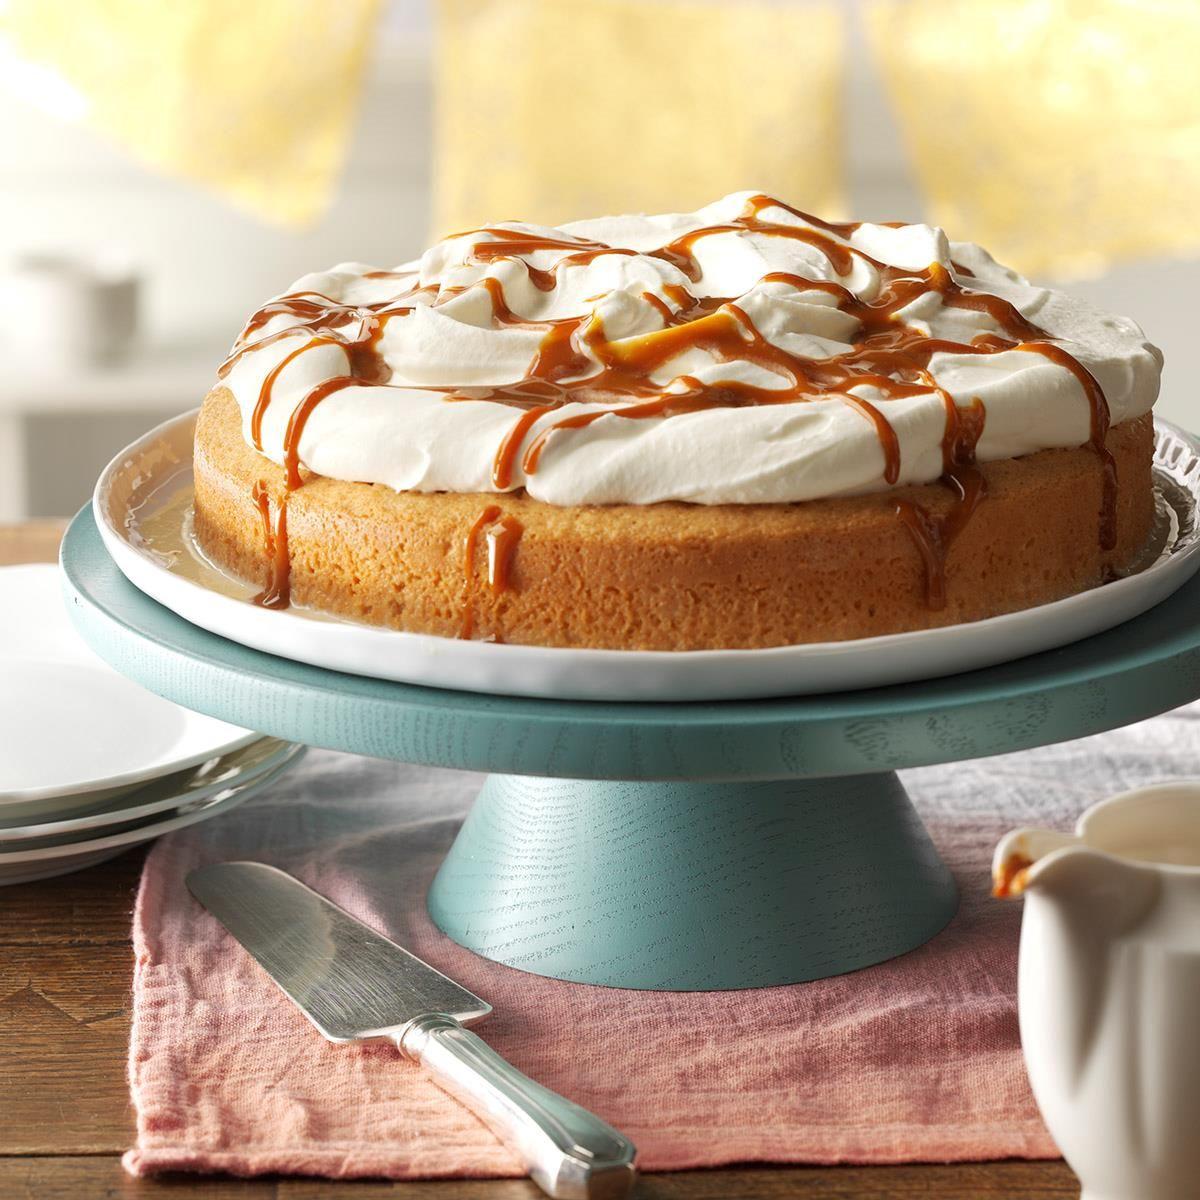 Classic Tres Leches Cake | Receta | Tortas/pasteles, Nombres y Mexicanos